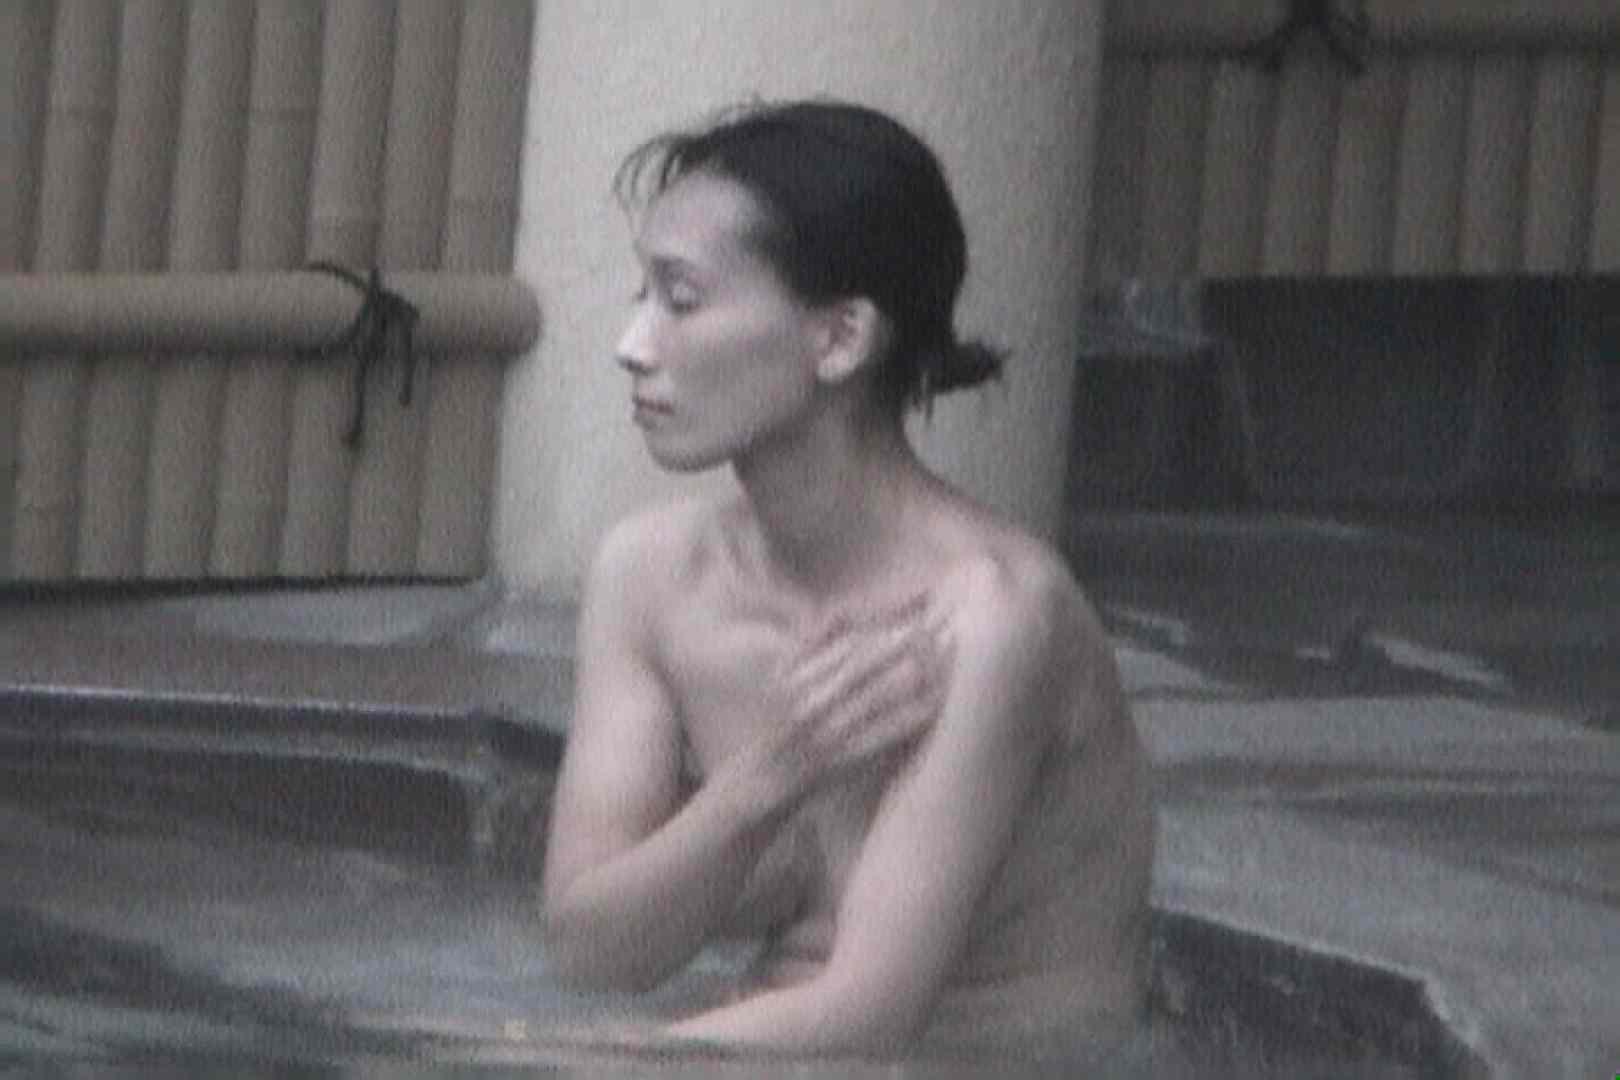 Aquaな露天風呂Vol.557 露天風呂編 | 盗撮シリーズ  100PIX 9